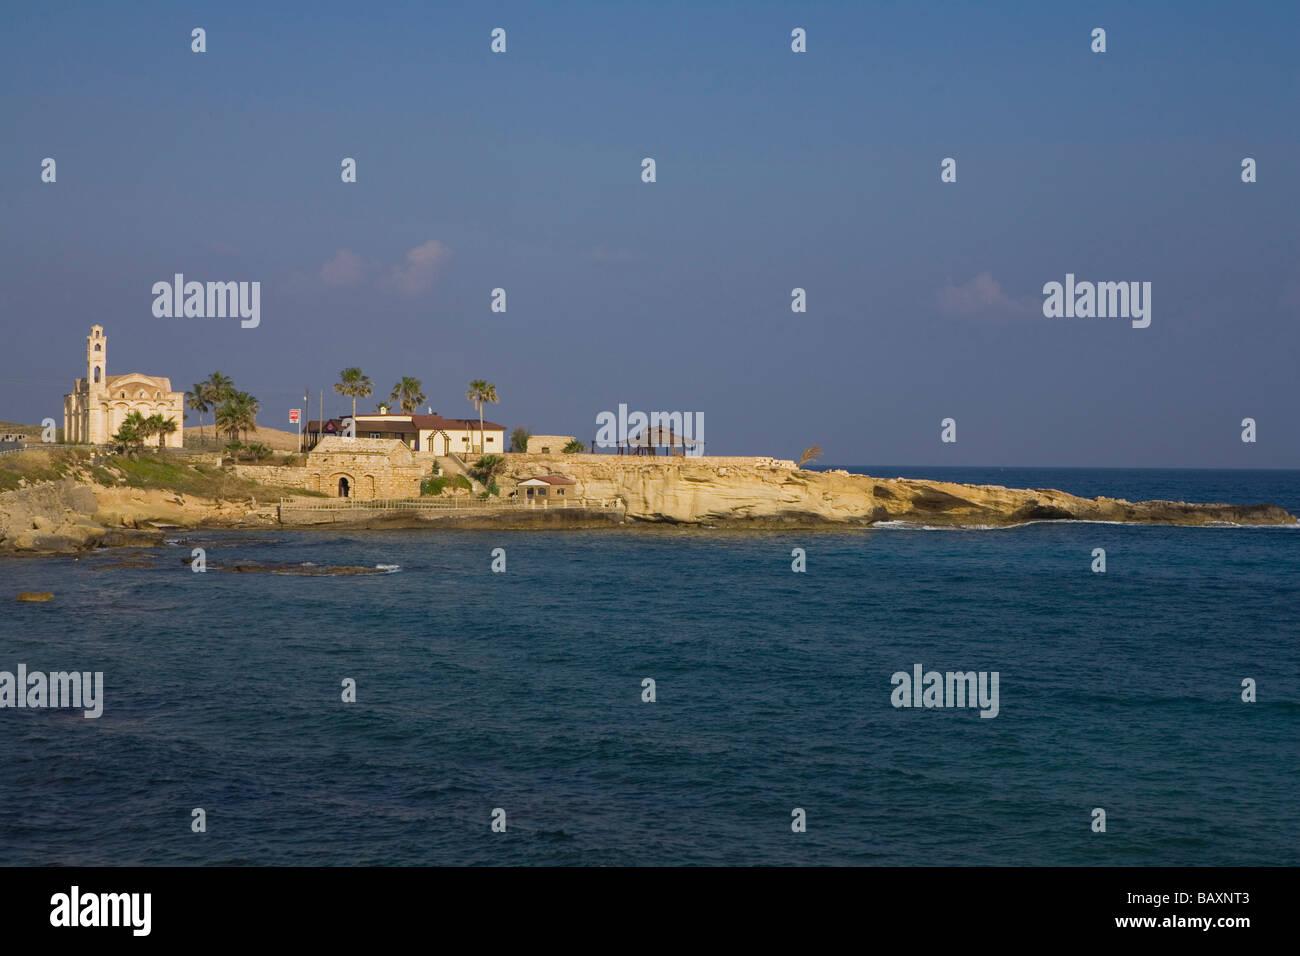 Agios Thyrsos, church along the coast near Erenkoy, near Gialousa, North Cyprus, Cyprus Stock Photo